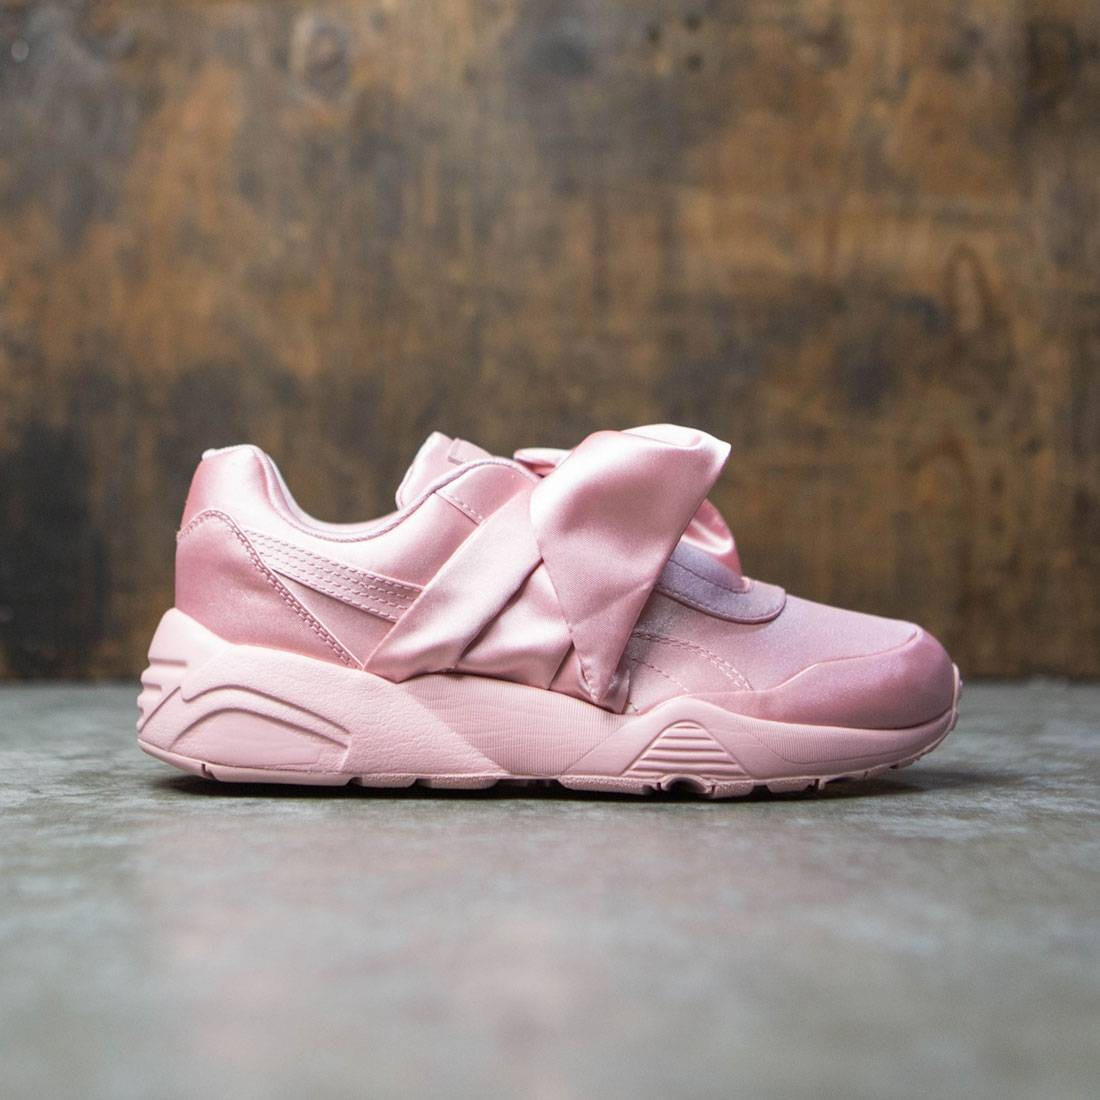 classic fit 90e3b 3100f Puma x Fenty By Rihanna Women Bow Sneaker (pink / silver)